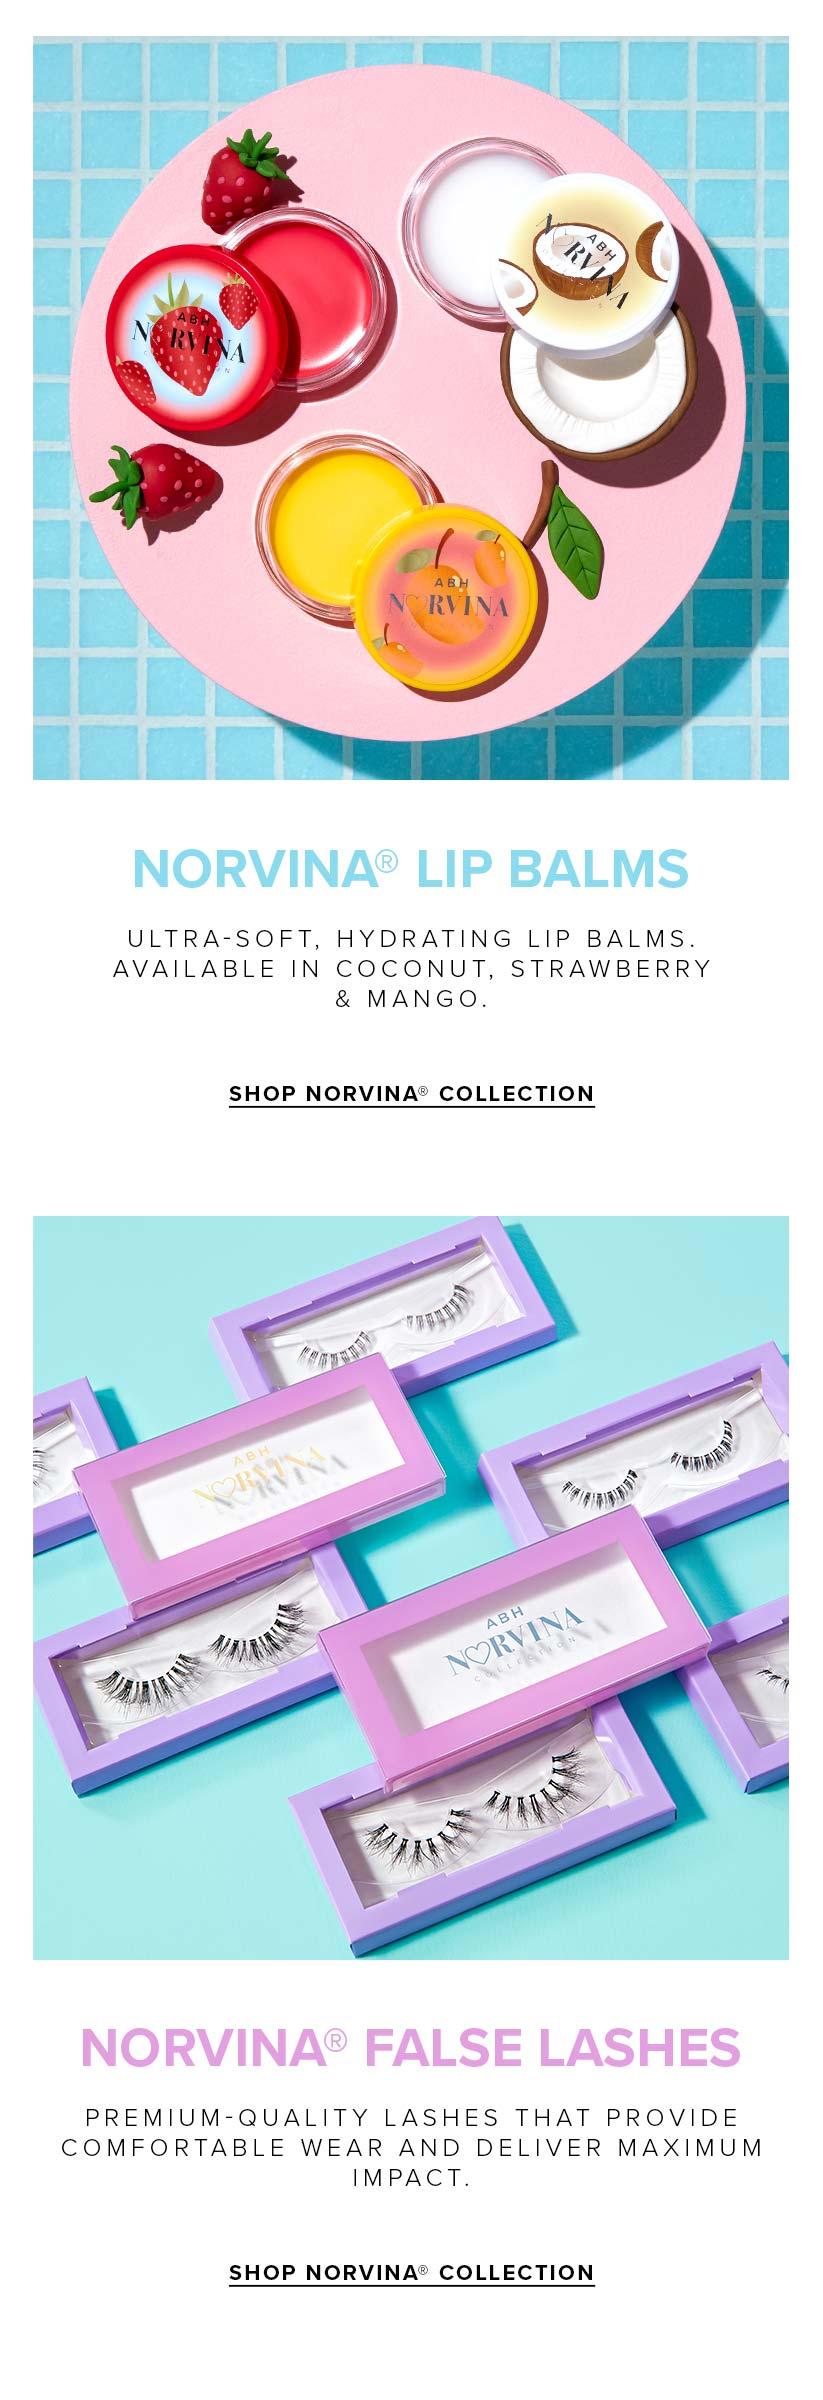 Norvina Lip Balms and Norvina False Lashes